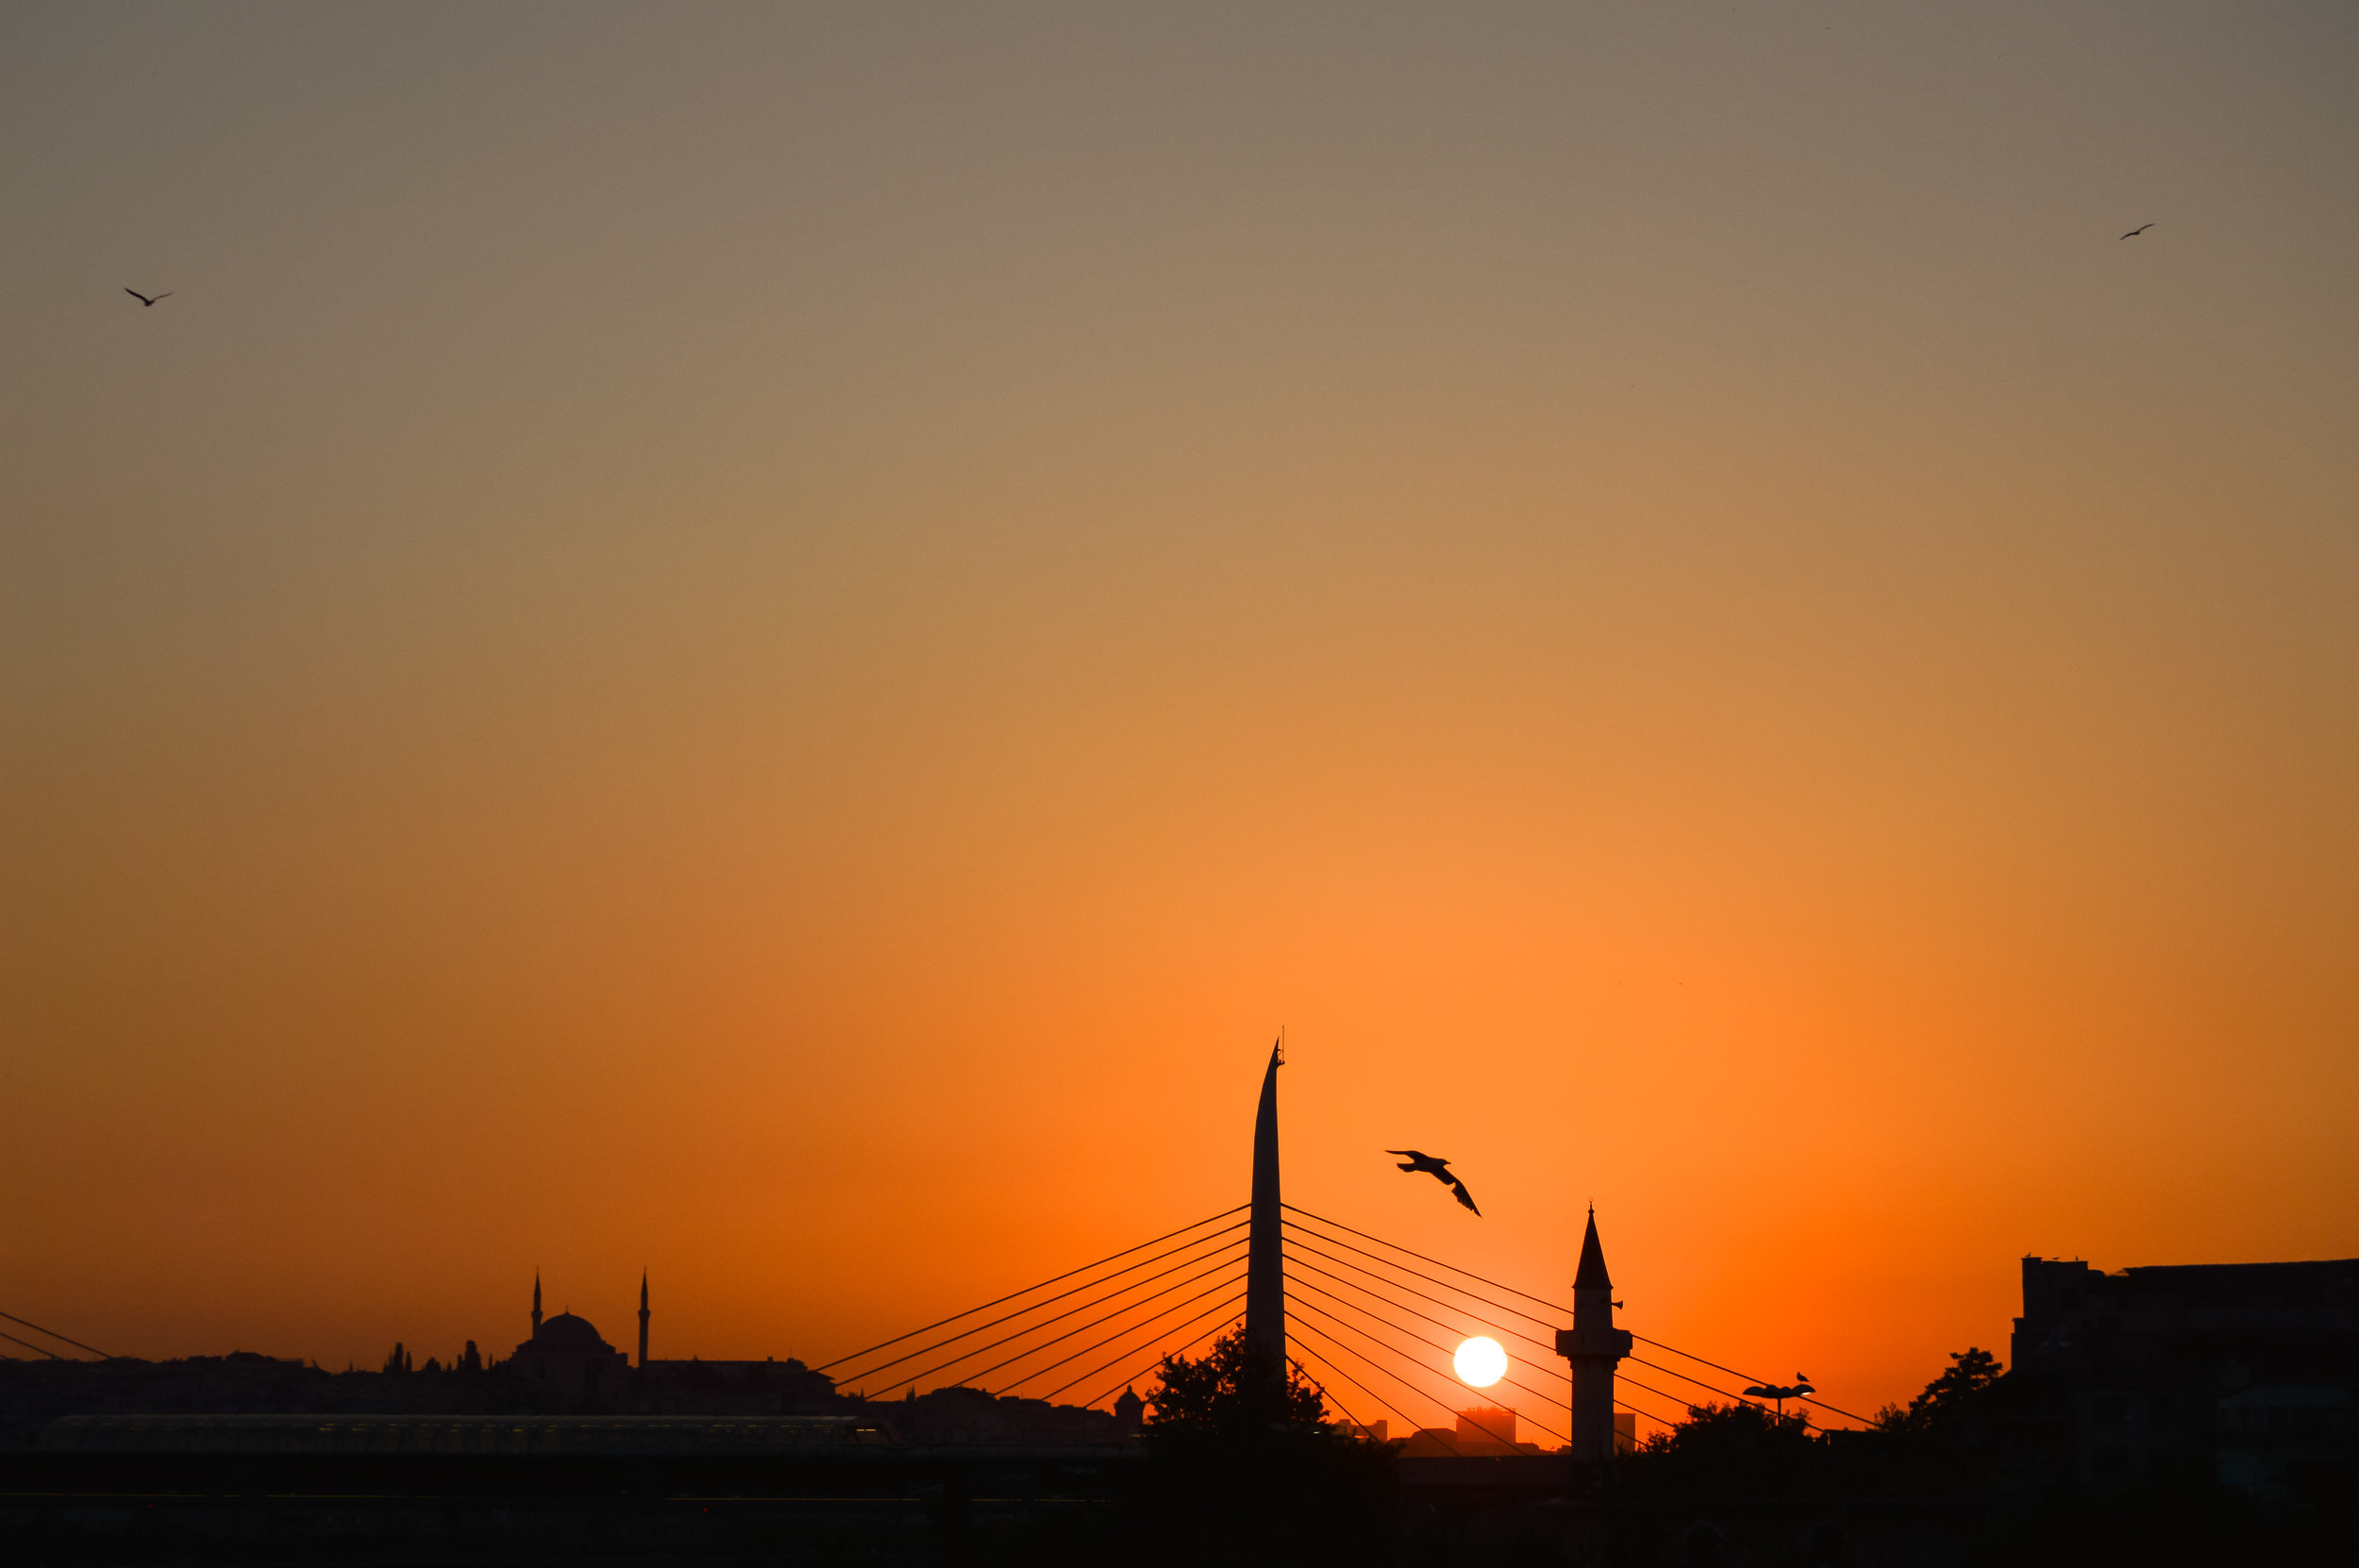 View Golden Horn Metro Bridge Rowhomes Mosques Skyline Bosporus Bosphorus Blue Sky Muslim Ottoman Empire Architecture Istanbul Turkey Blue Mosque Hagia Sophia